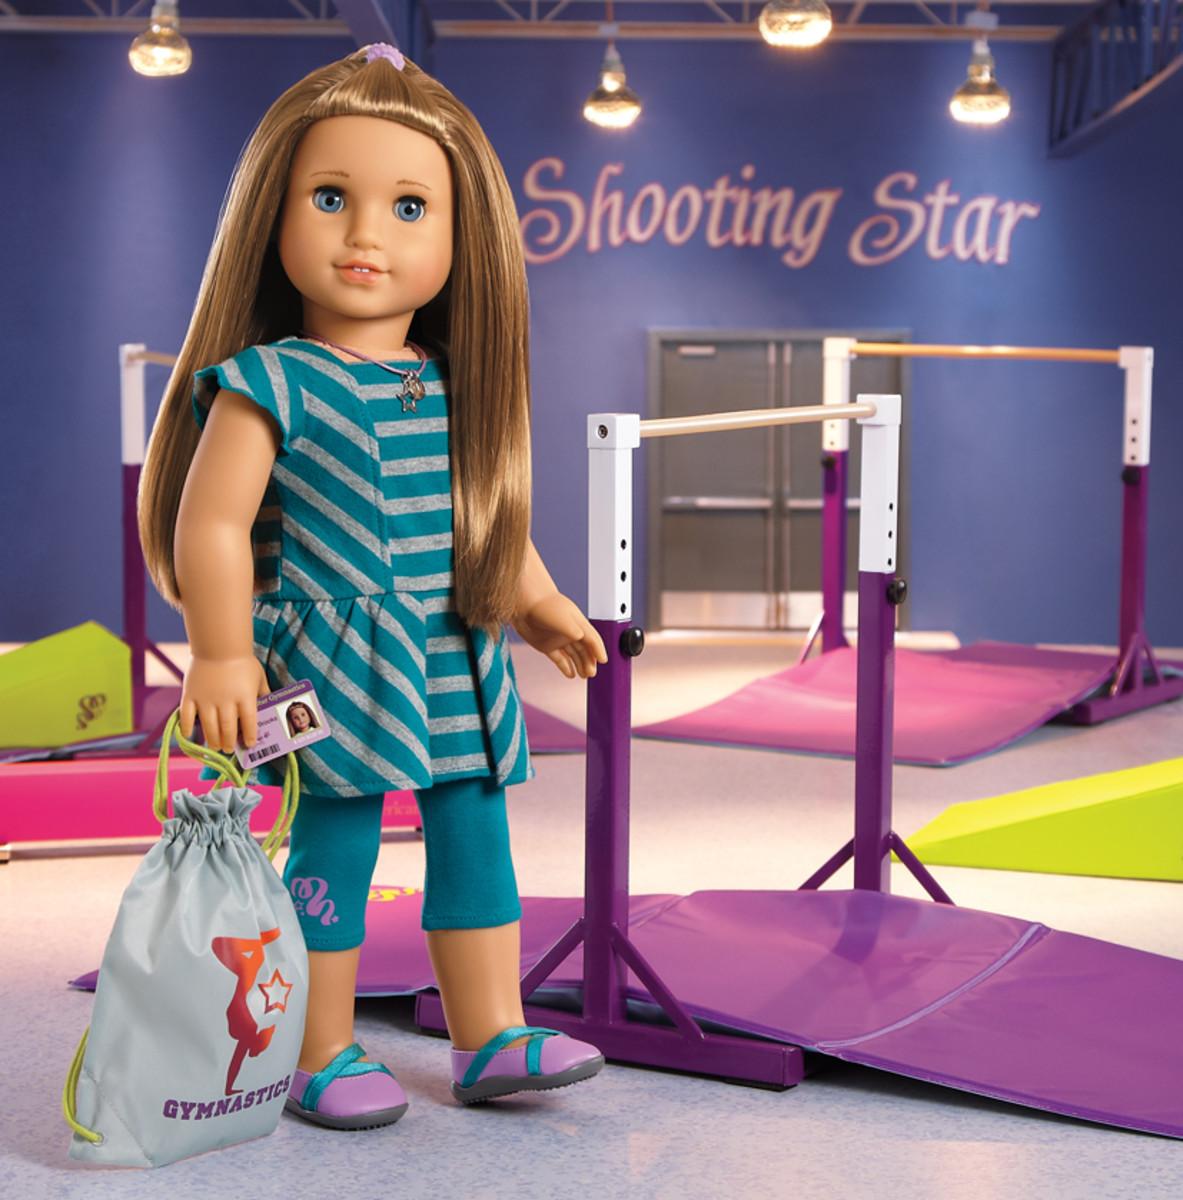 Teal Gymnastics Balance Beam for 18 inch Doll or 18 inch doll